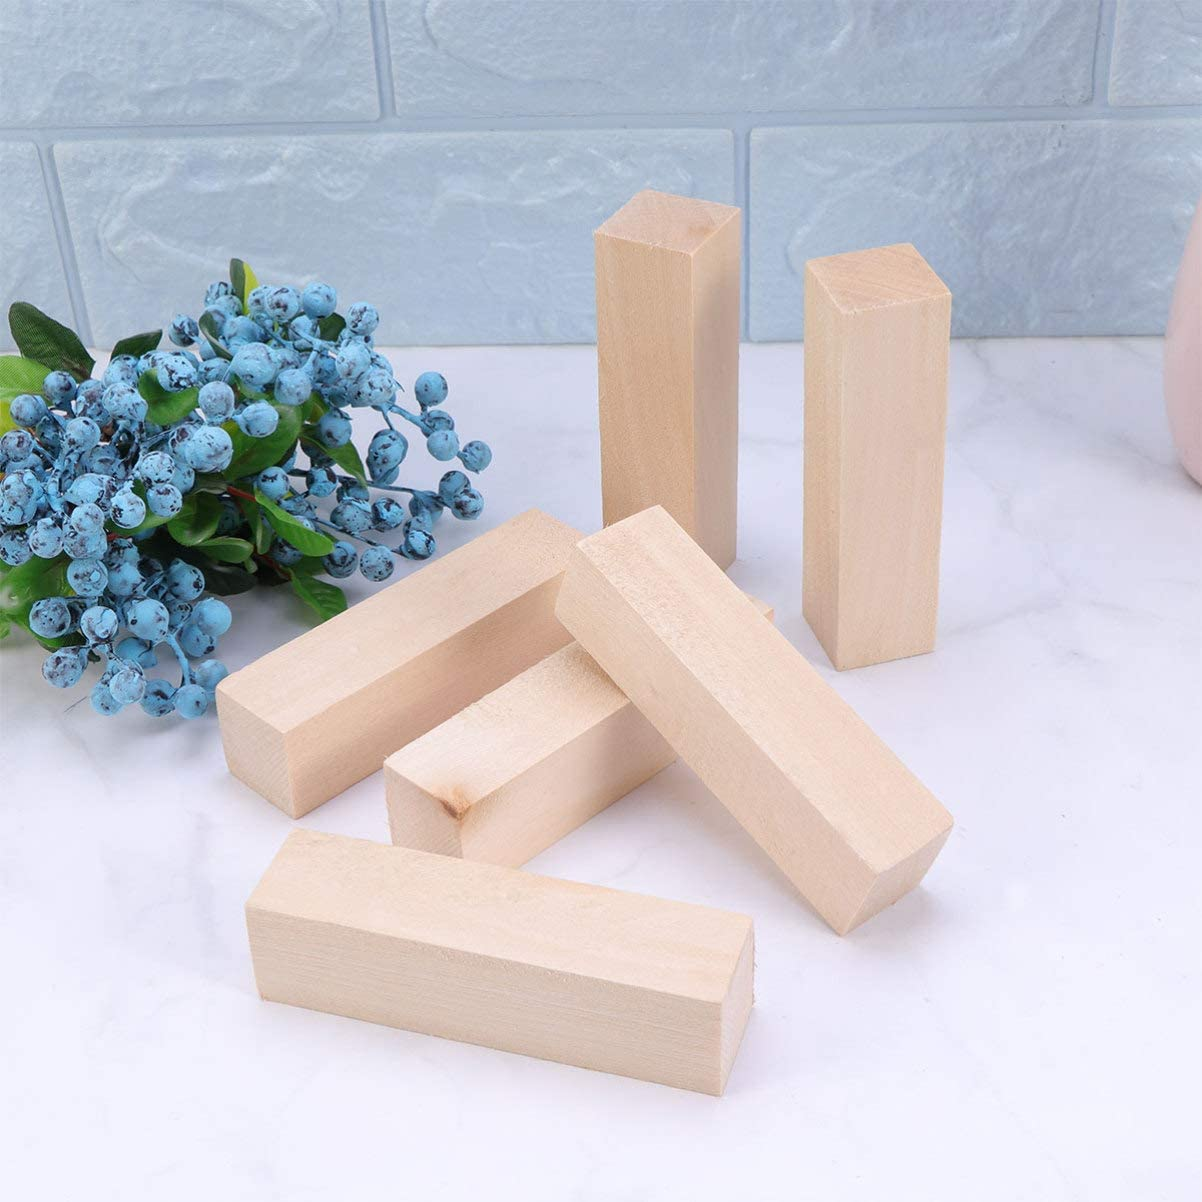 Exceart 10pcs Wood Block Blank Square Natural Wood Blocks Carving Wood Craft Wood for Art Design Craft Making